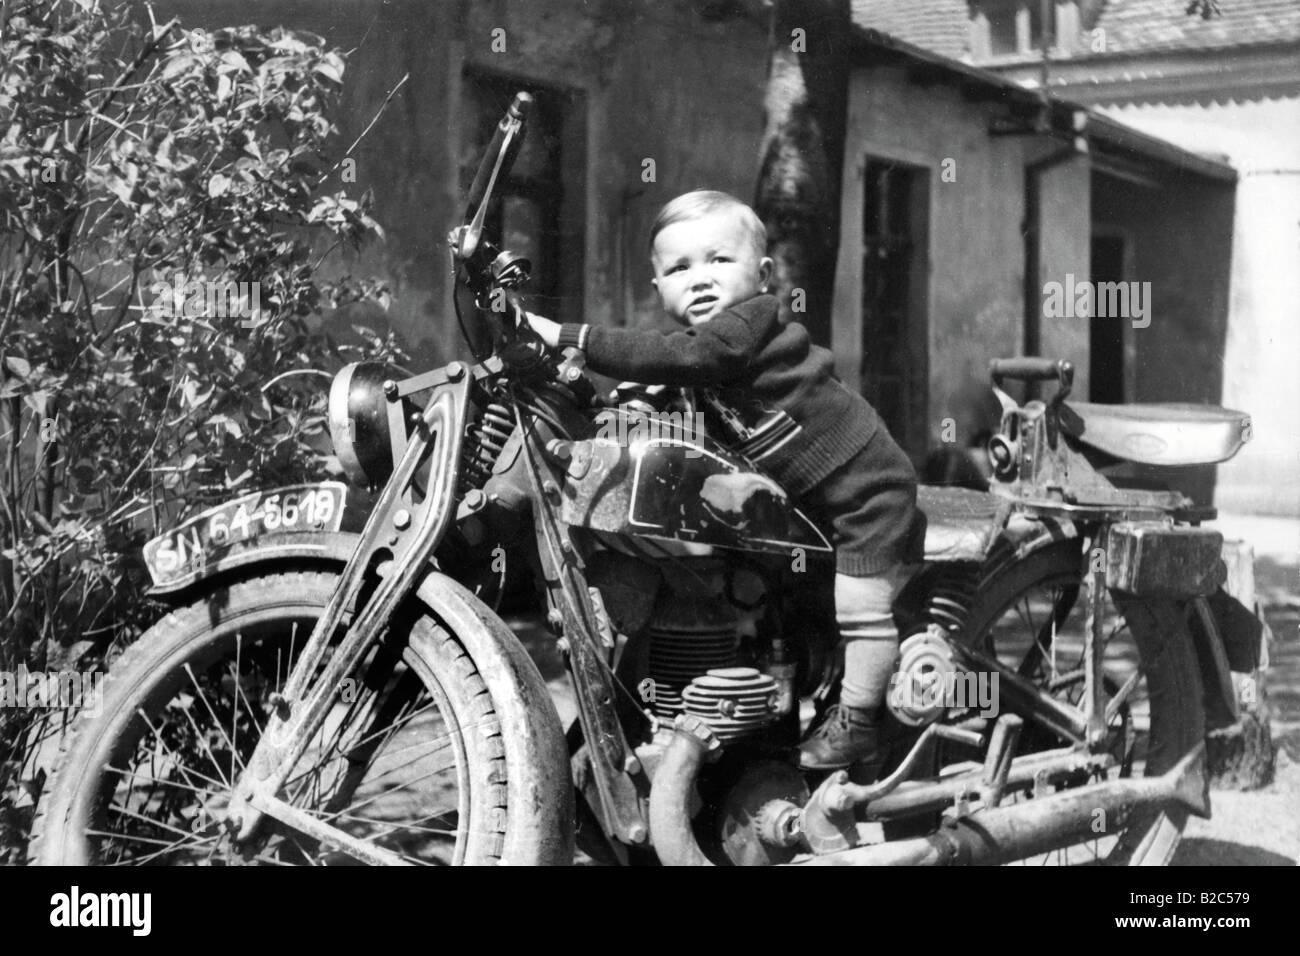 Small child on a motorbike, historical photo, circa 1940 - Stock Image